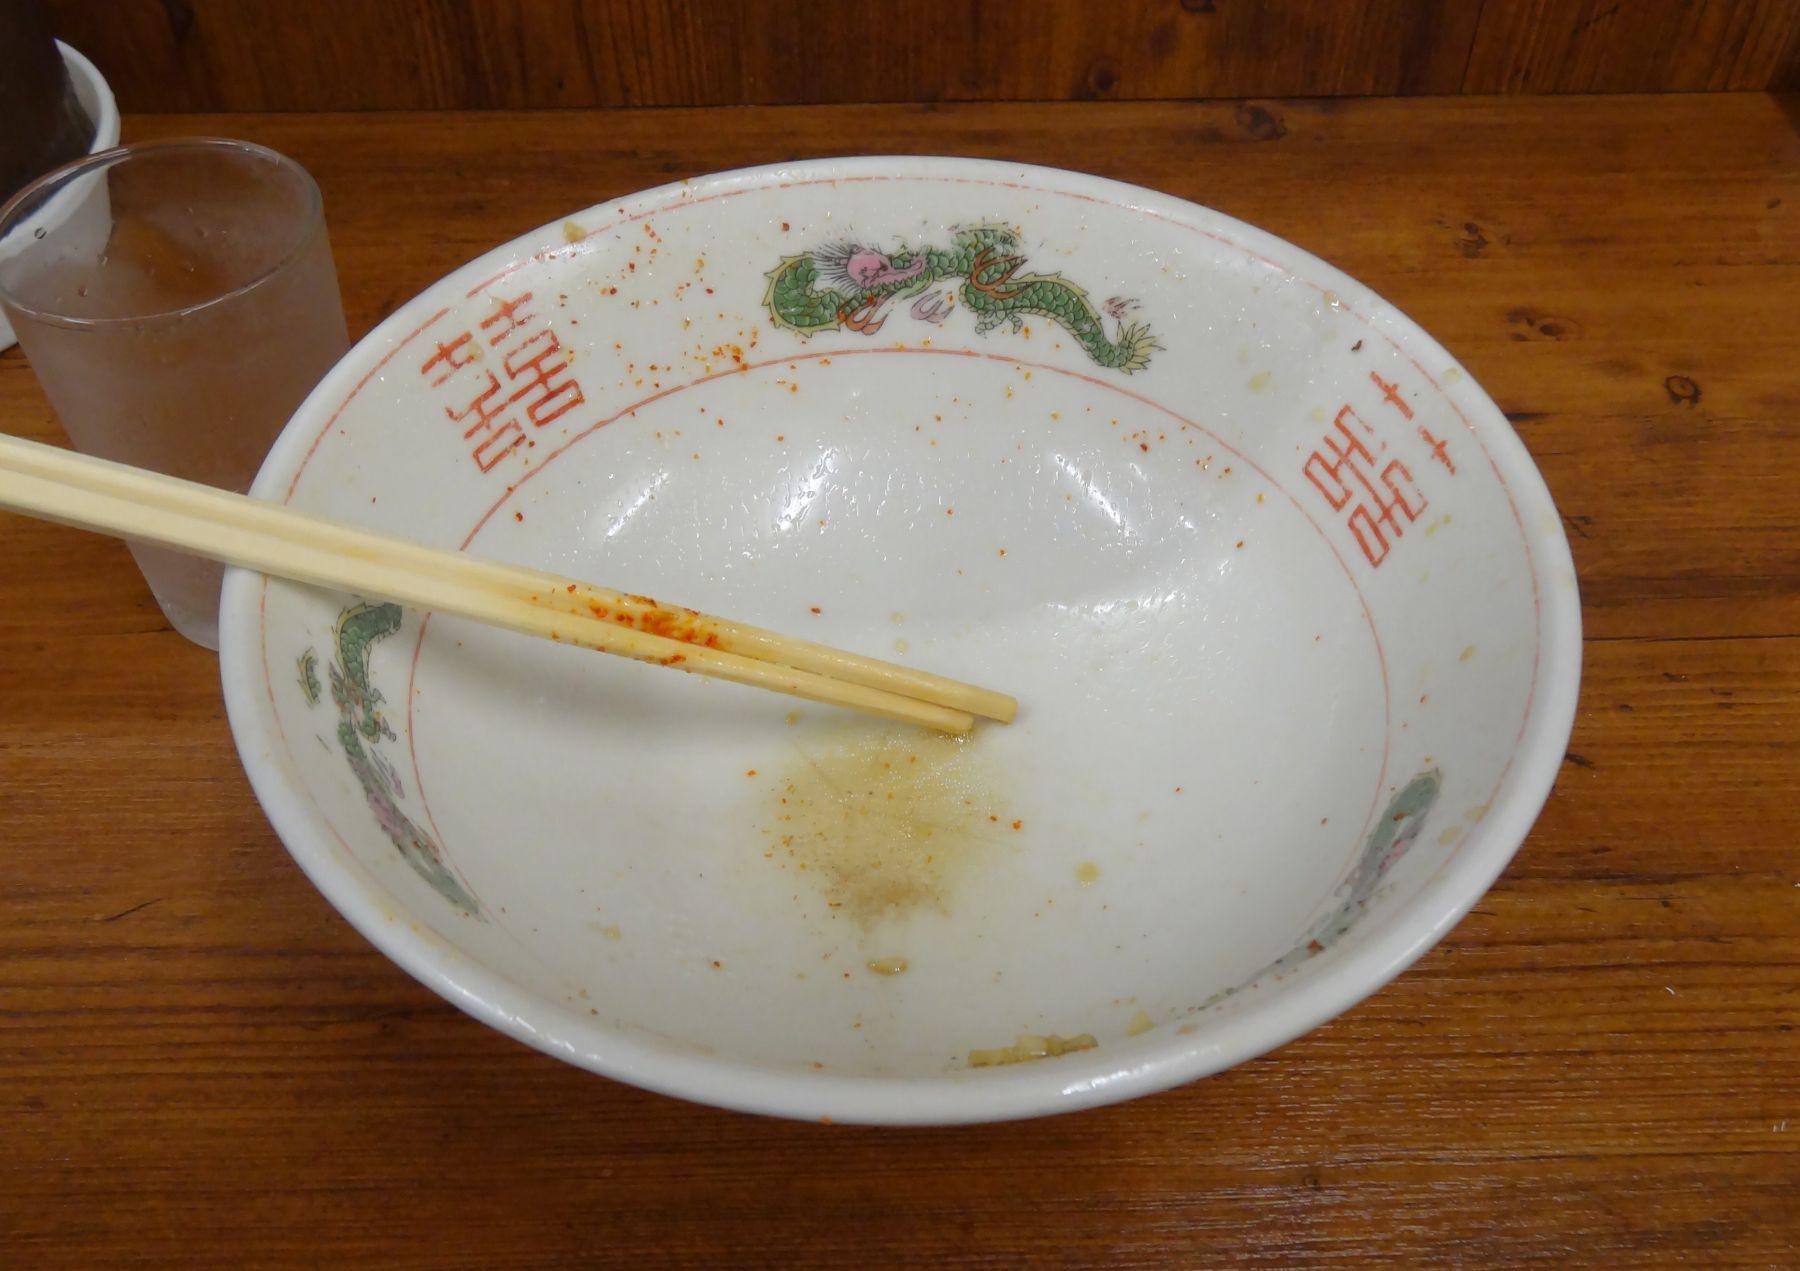 20121112005shinagawa.jpg